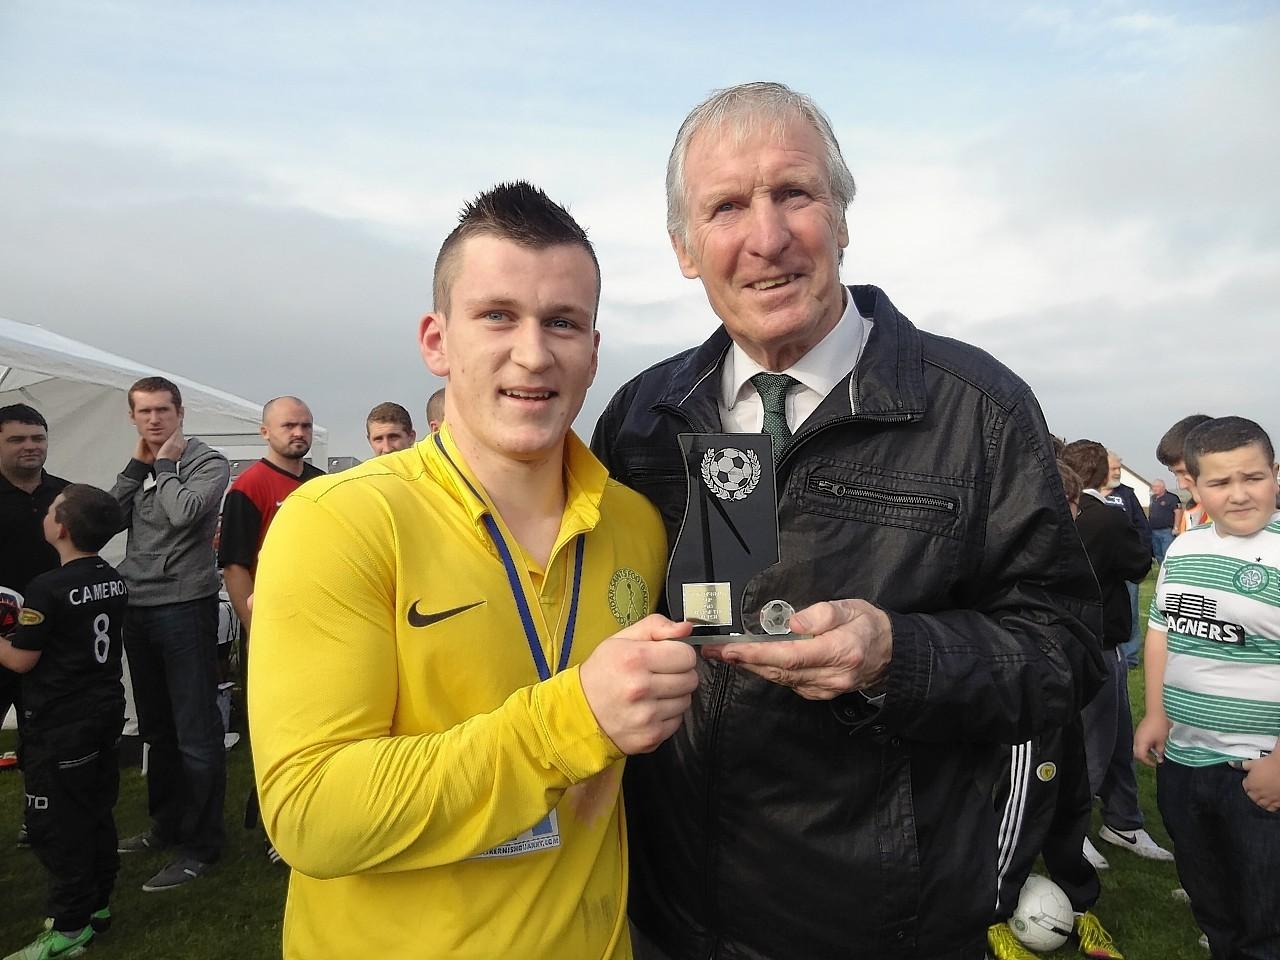 Promising young footballer Carl Macphee